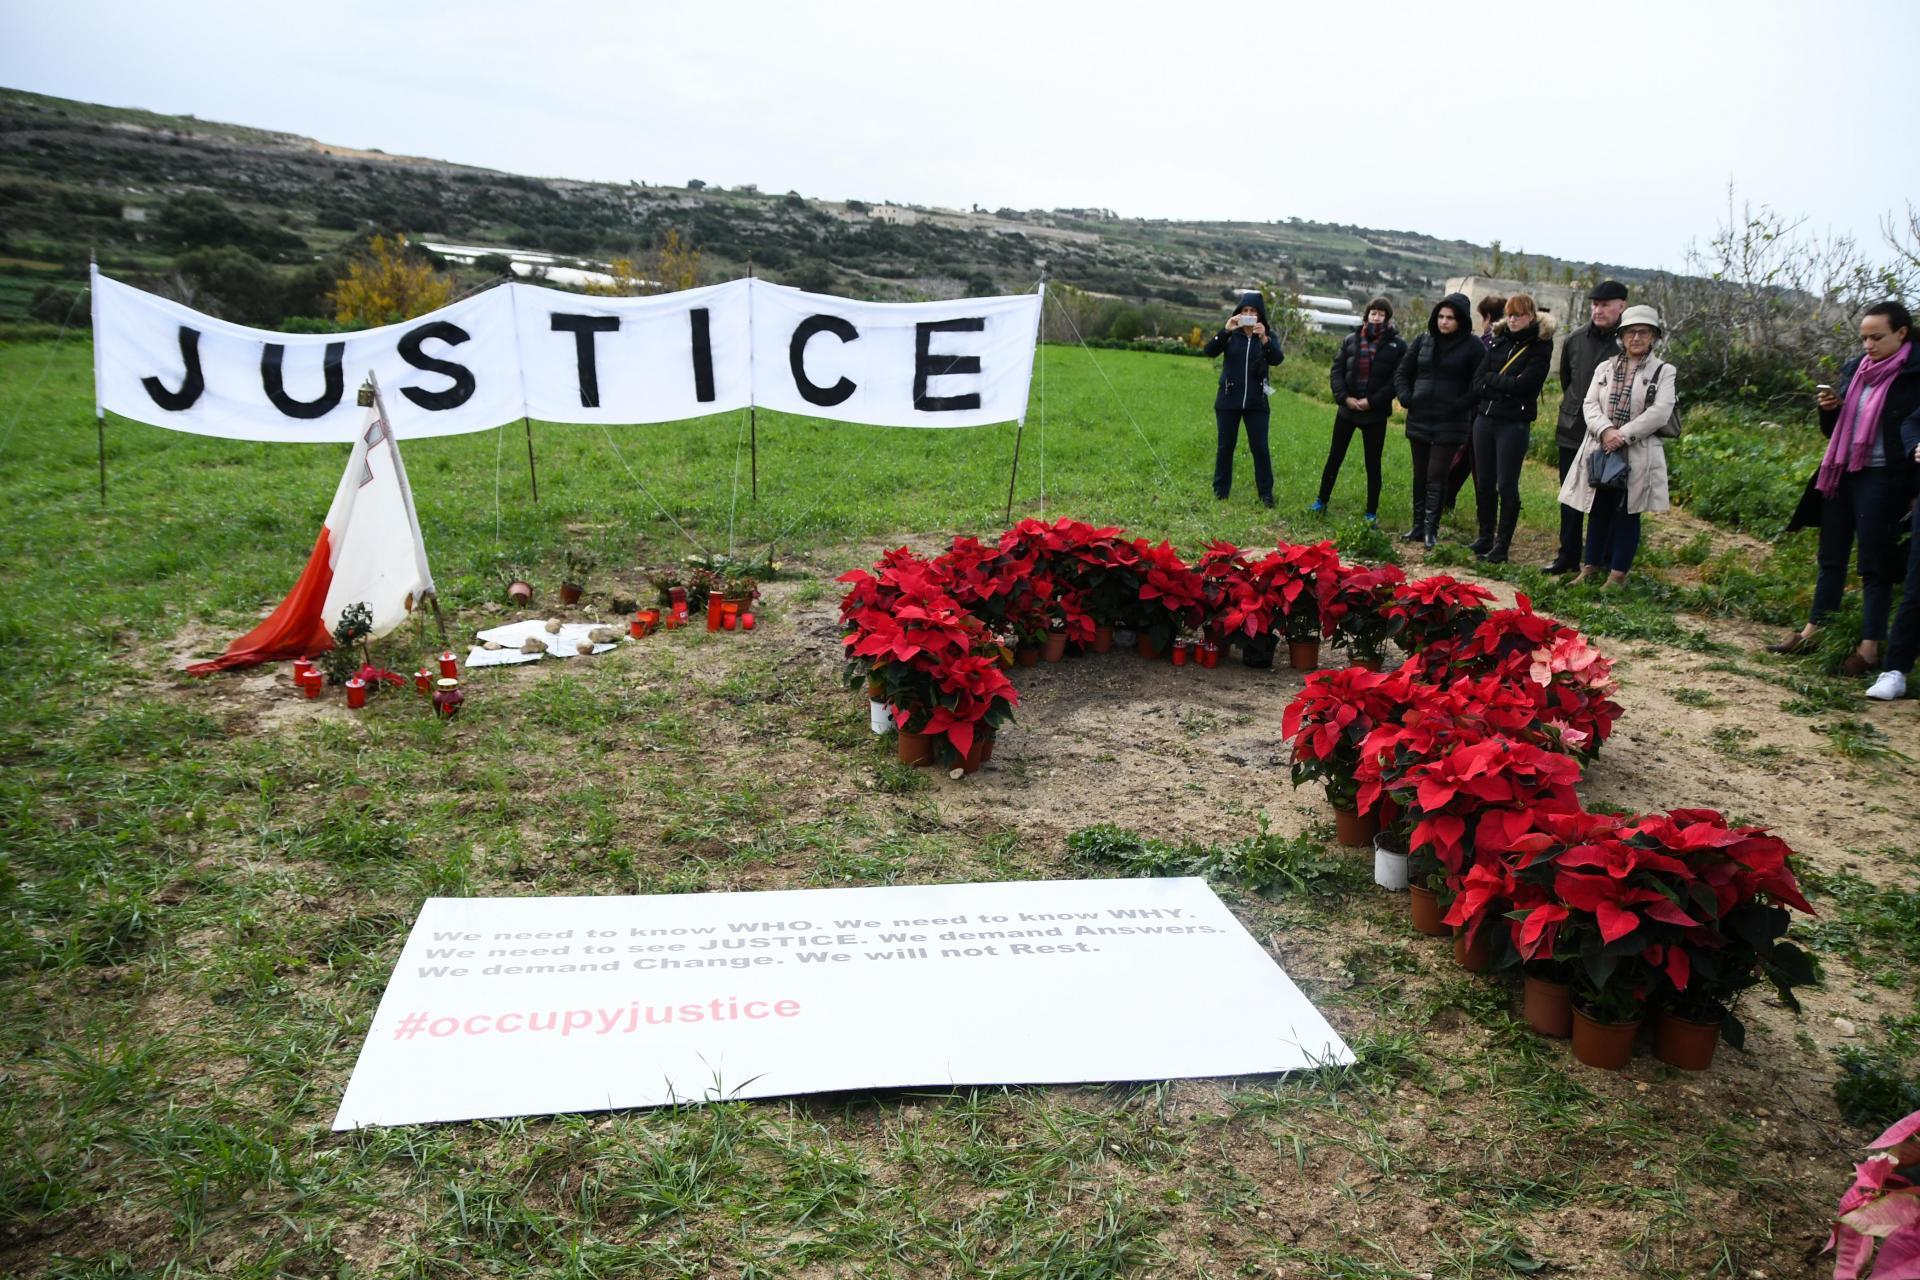 Vigil calling for justice for Daphne Caruana Galizia at the site of her murder in Bidnija.